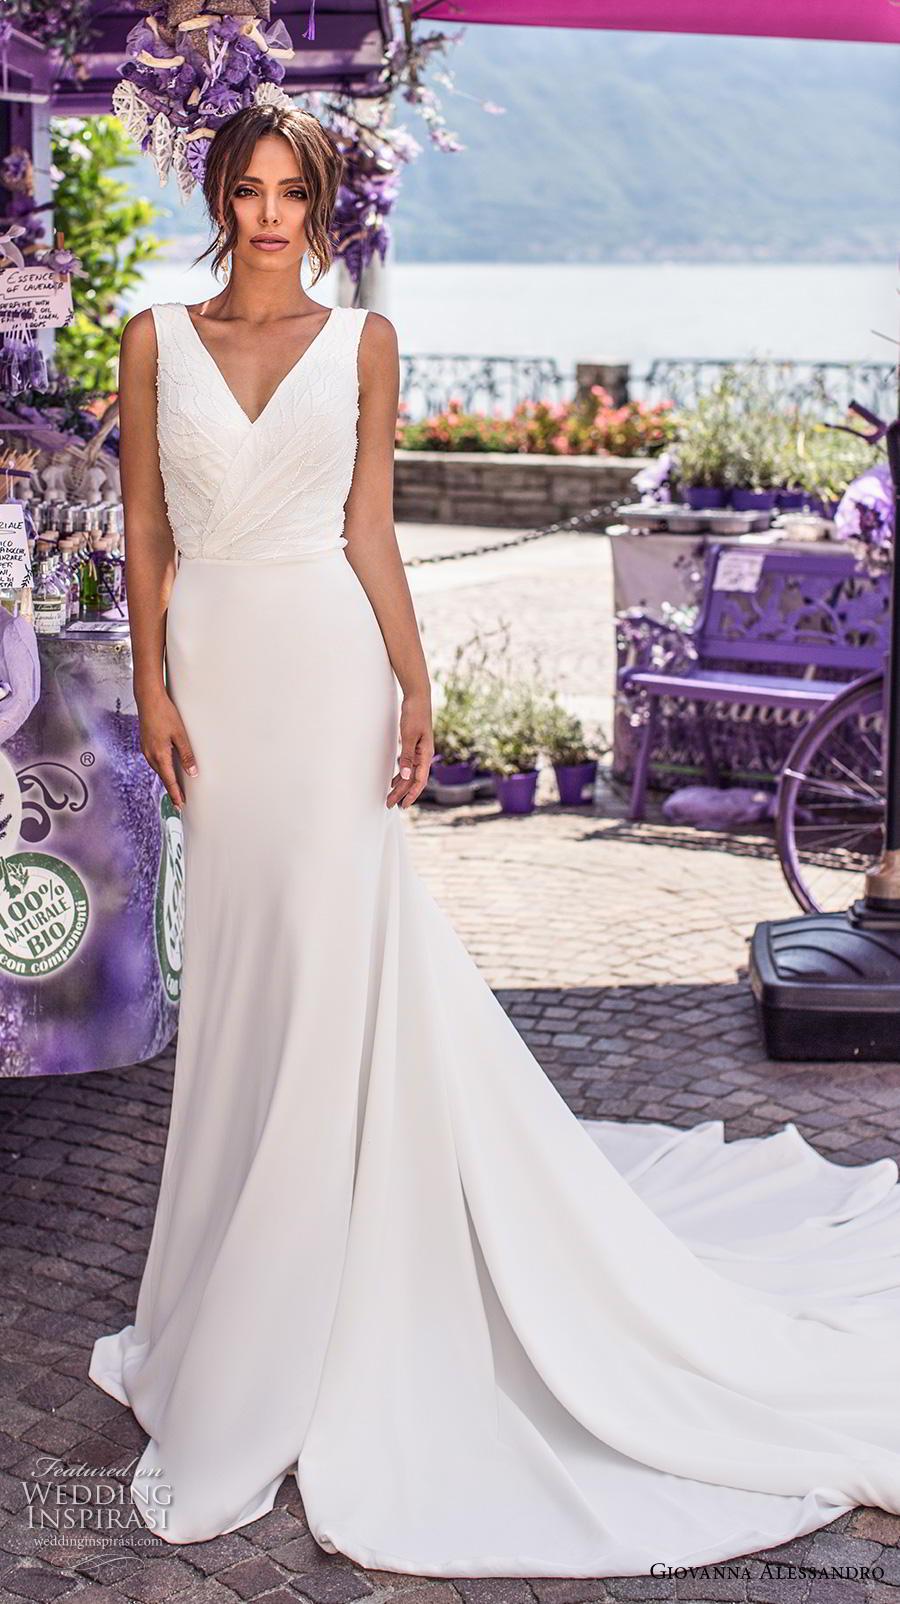 giovanna alessandro 2019 bridal sleeveless v neck wrap over heavily embellished bodice simple sheath wedding dress v back chapel train (2) mv